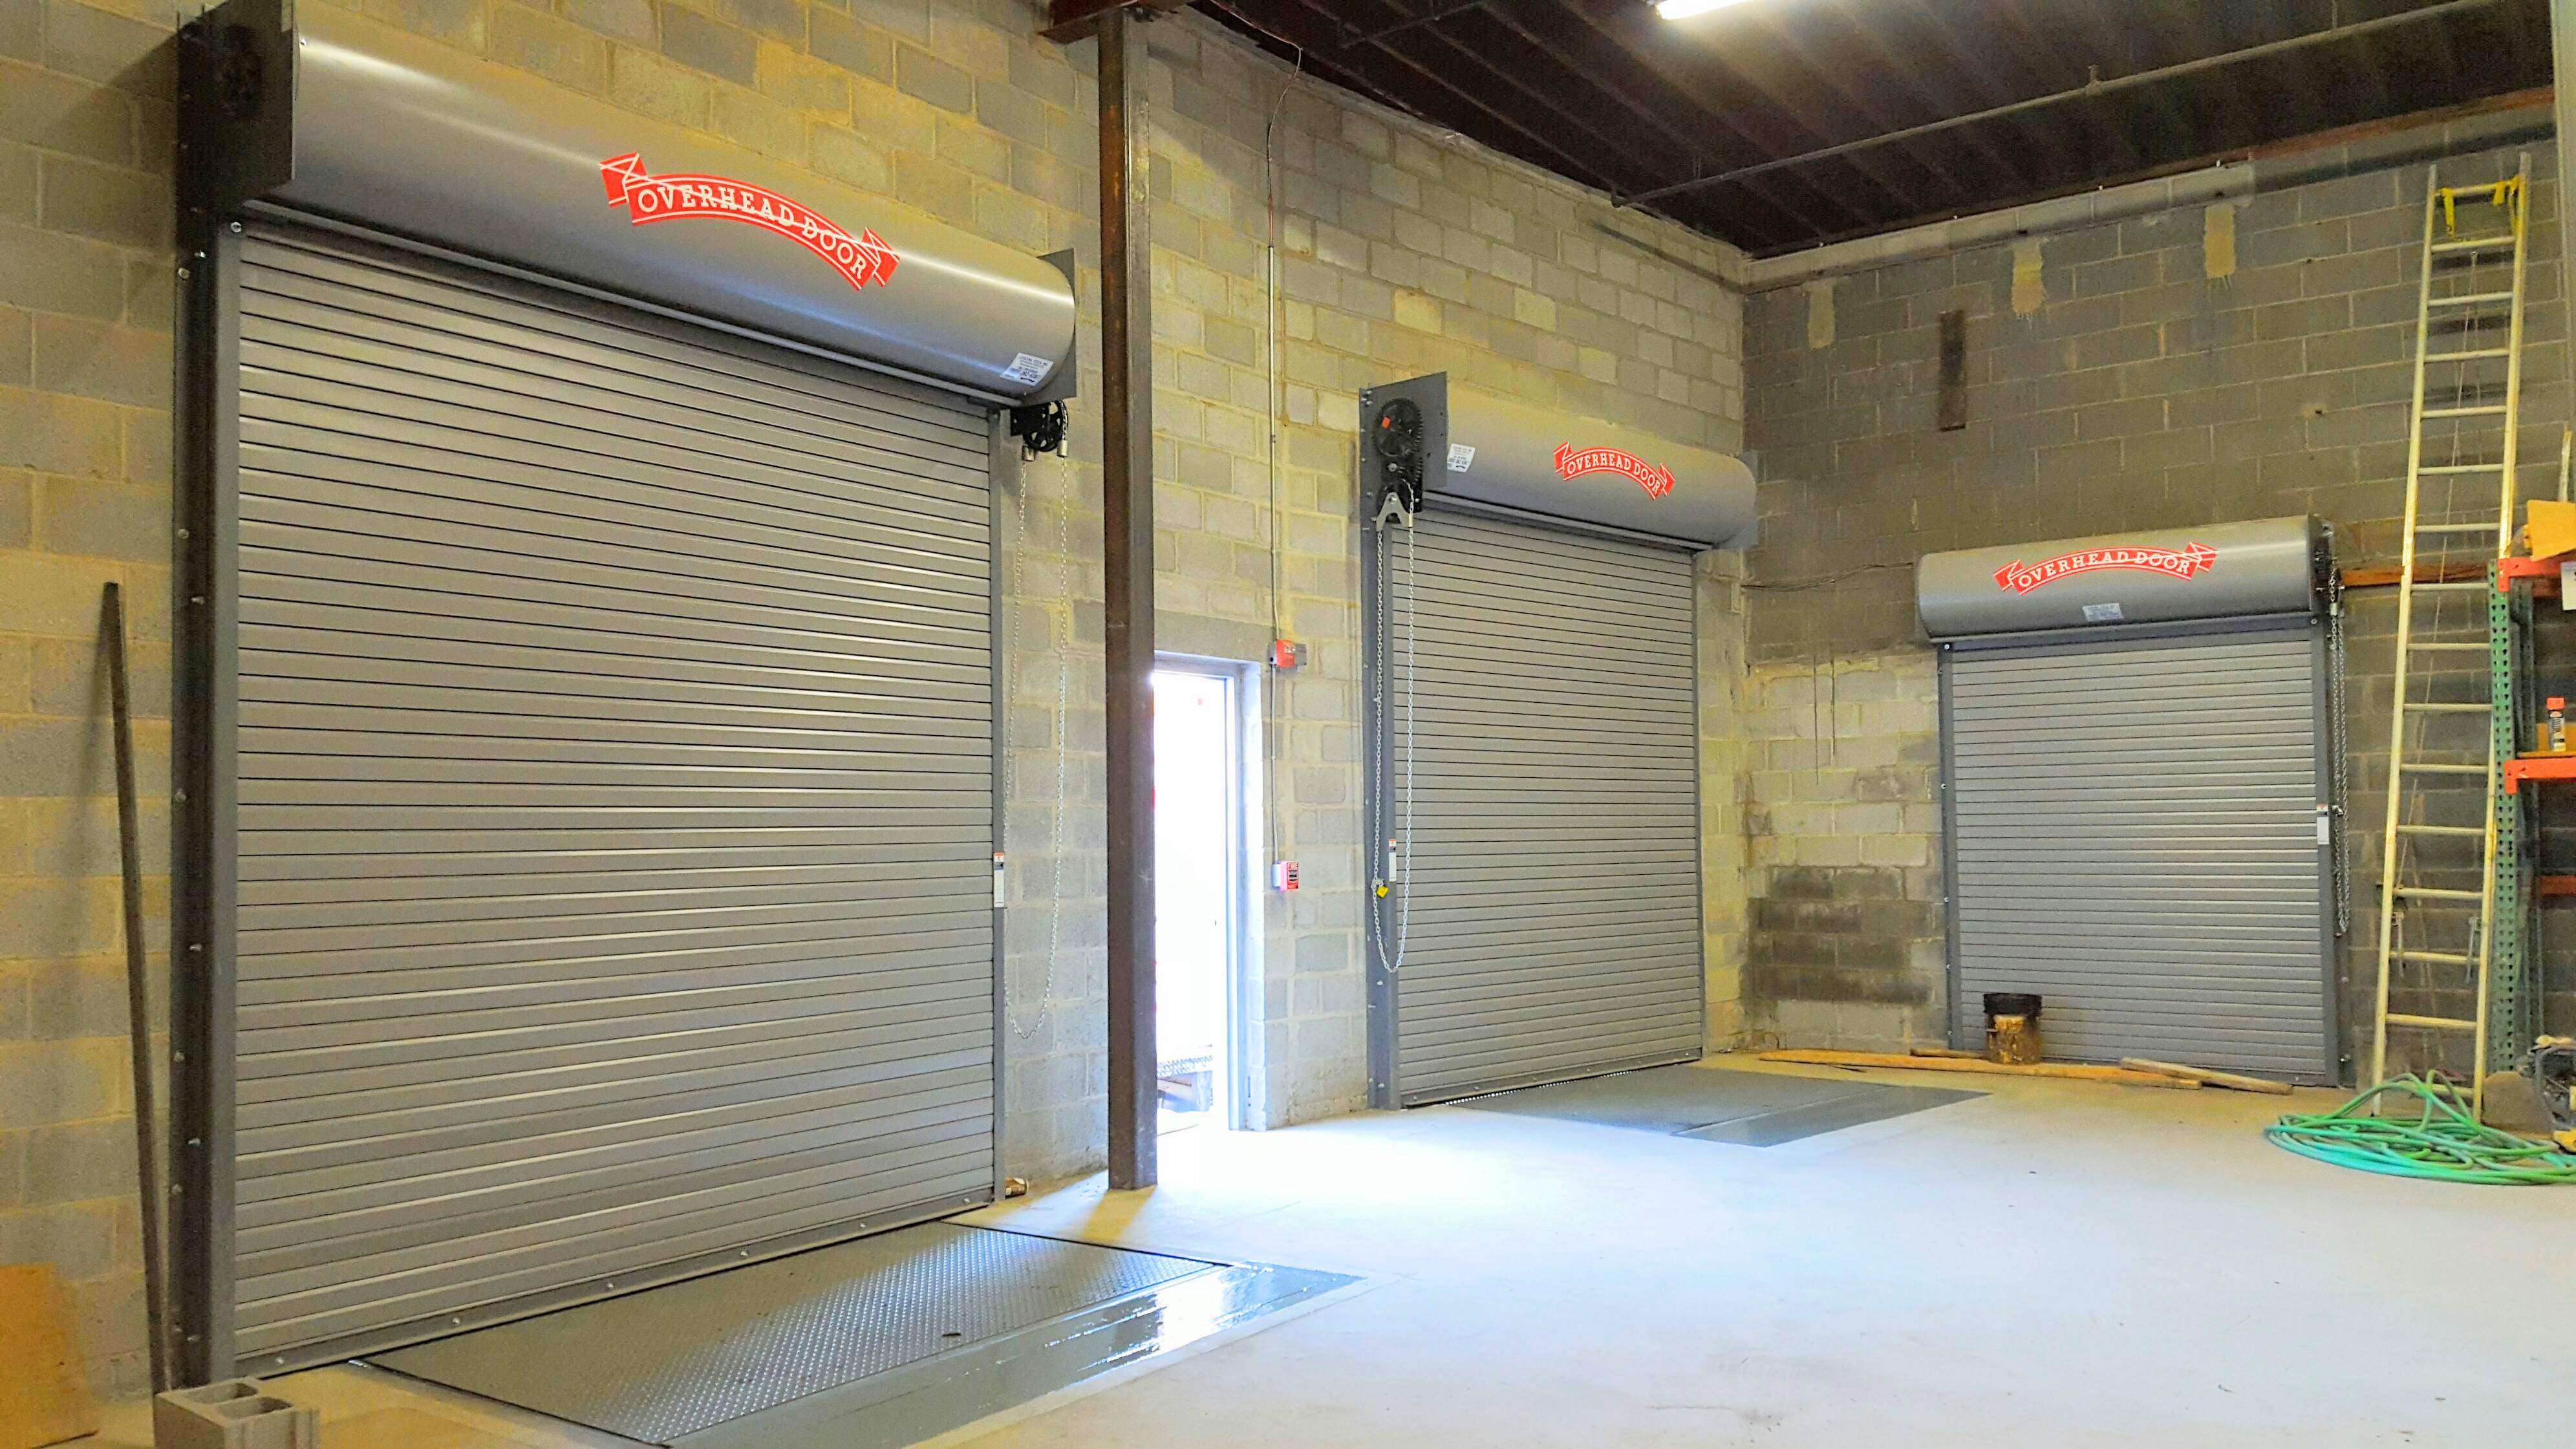 Insulated Loading Dock Rollup Doors Gates Bergen Hudson County, NJ